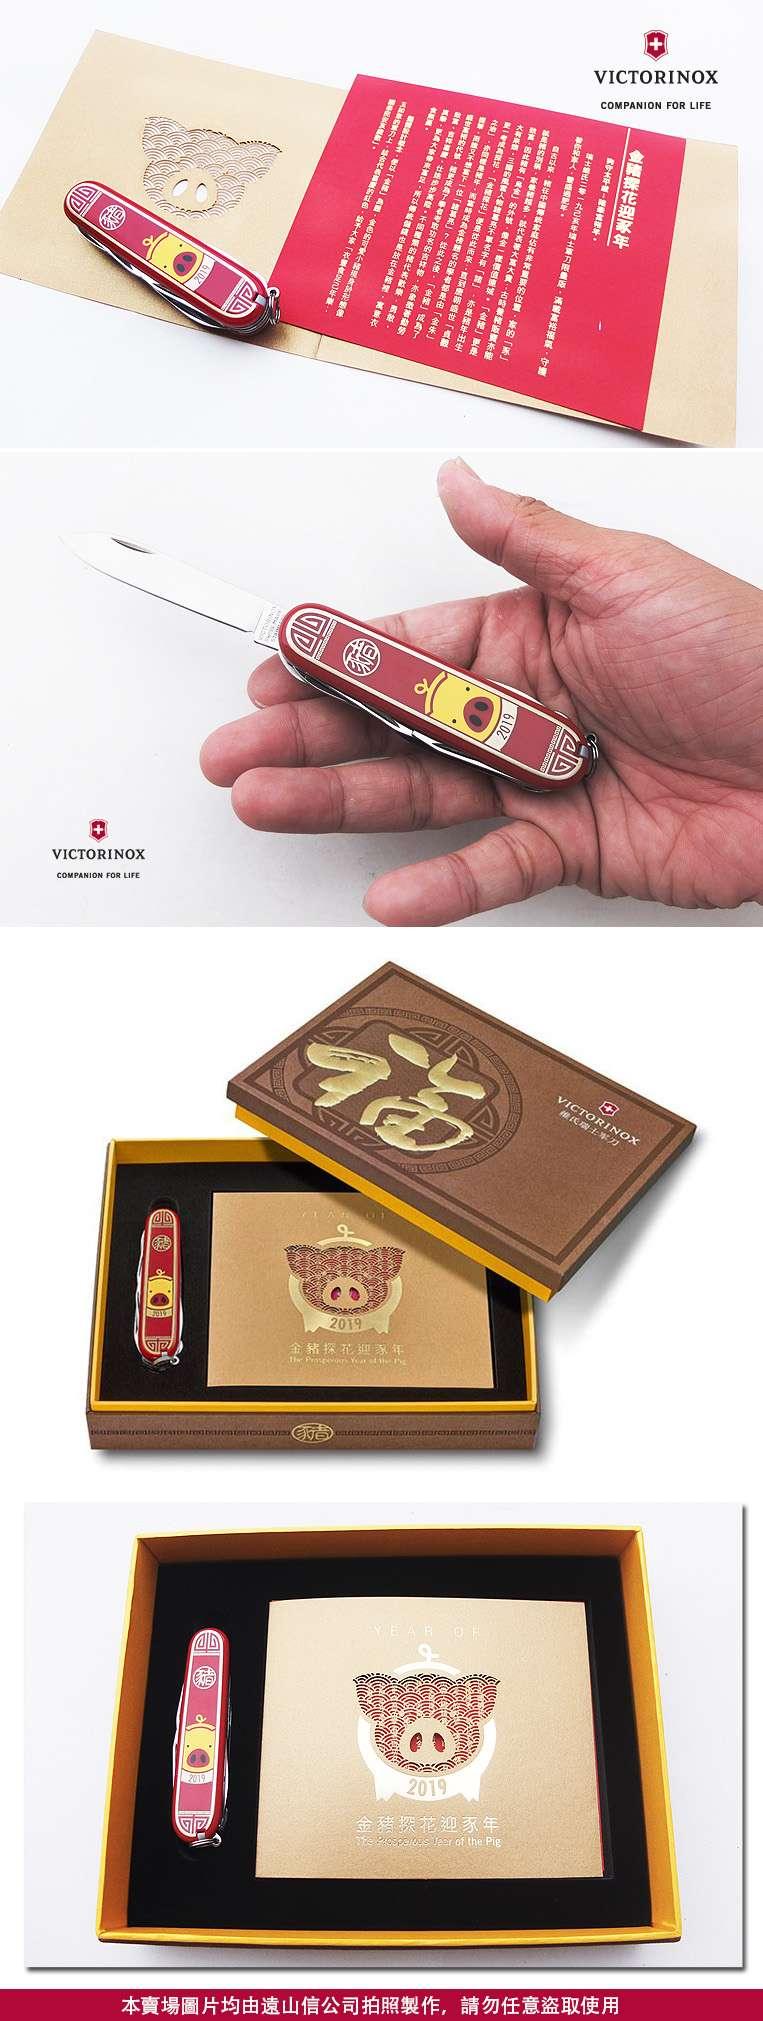 Victorinox Swiss Army Knife 91mm Huntsman 2019 Chinese